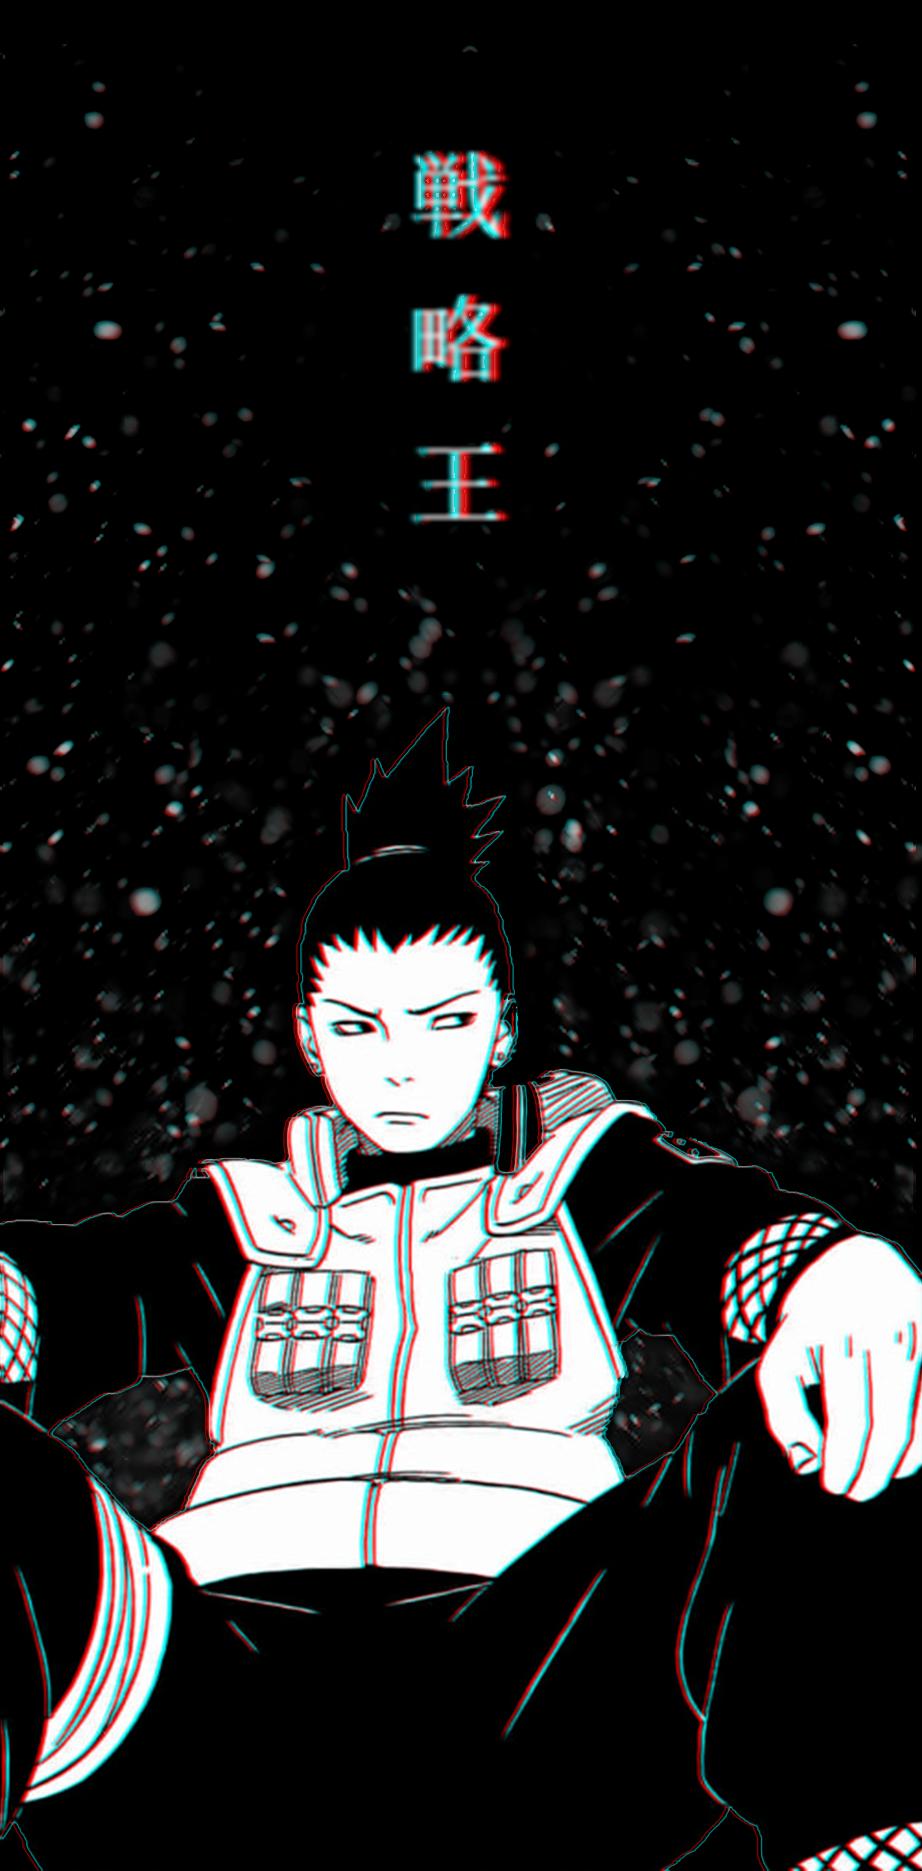 My First Edit I Made It Because I Saw Many People Asking For It Naruto Anime Manga Naruto Wallpaper Anime Wall Art Shikamaru Wallpaper